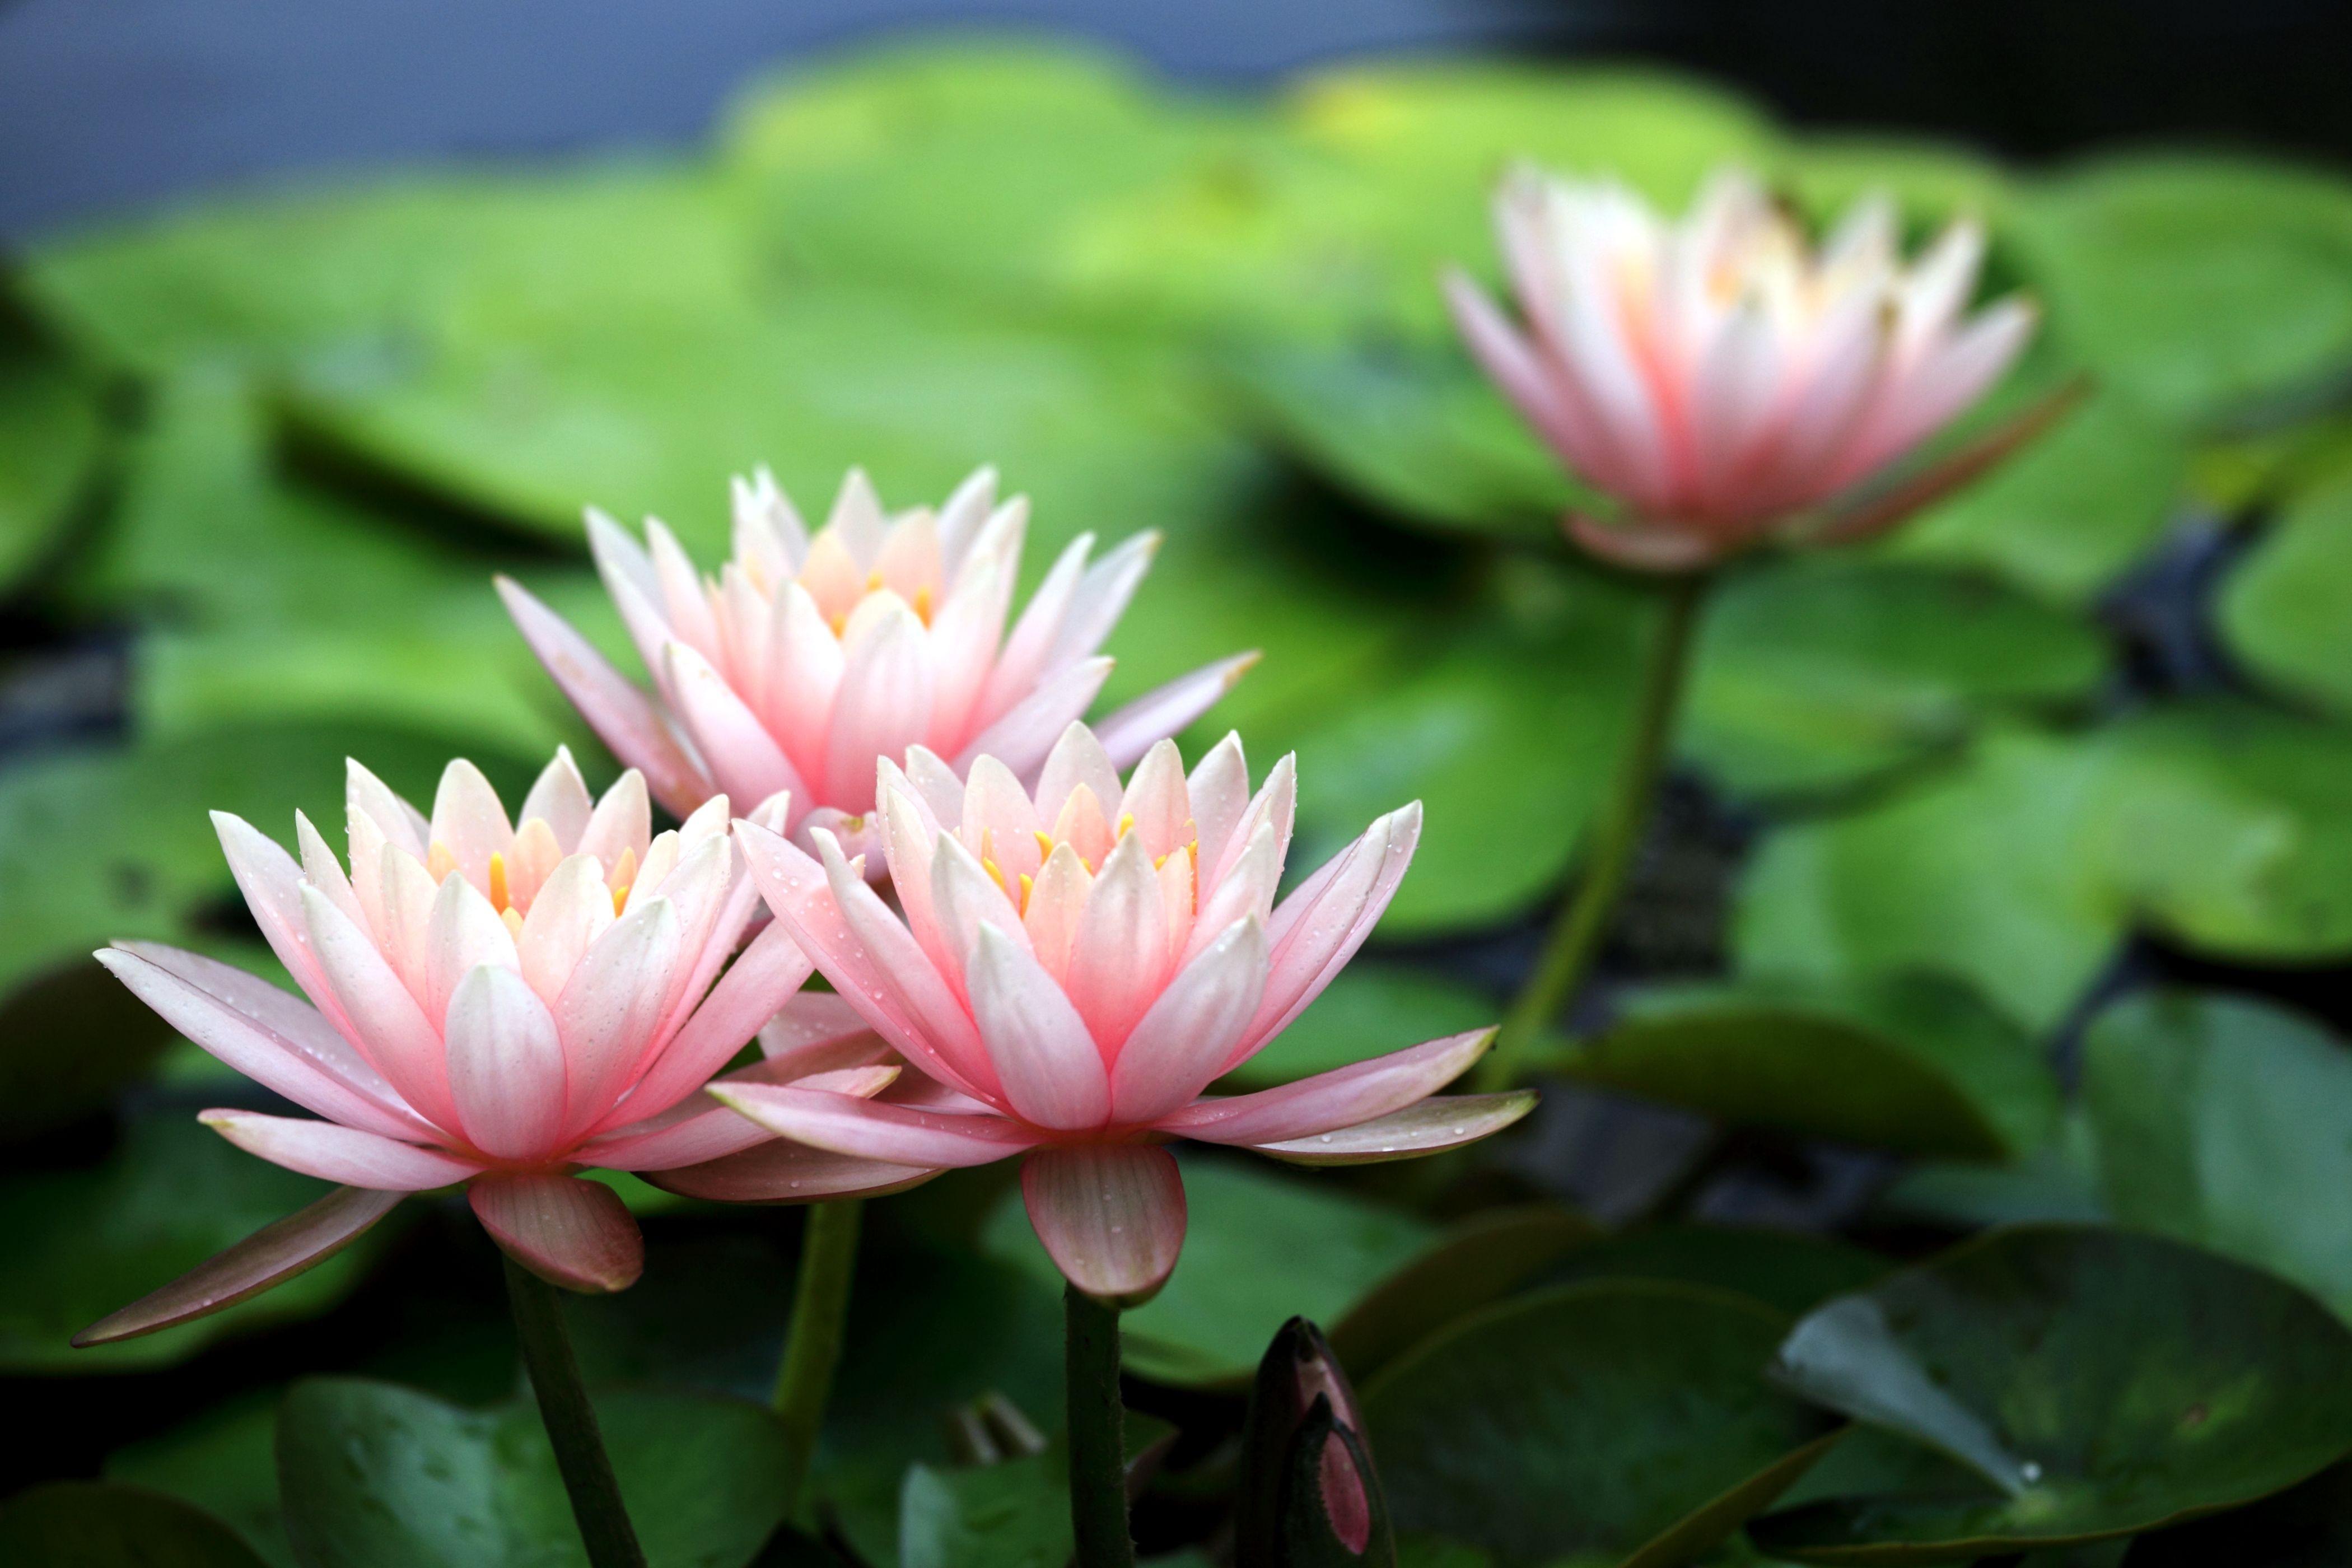 Pink water lily lilies flowers petals wallpaper 4200x2800 121843 pink water lily lilies flowers petals wallpaper 4200x2800 121843 wallpaperup izmirmasajfo